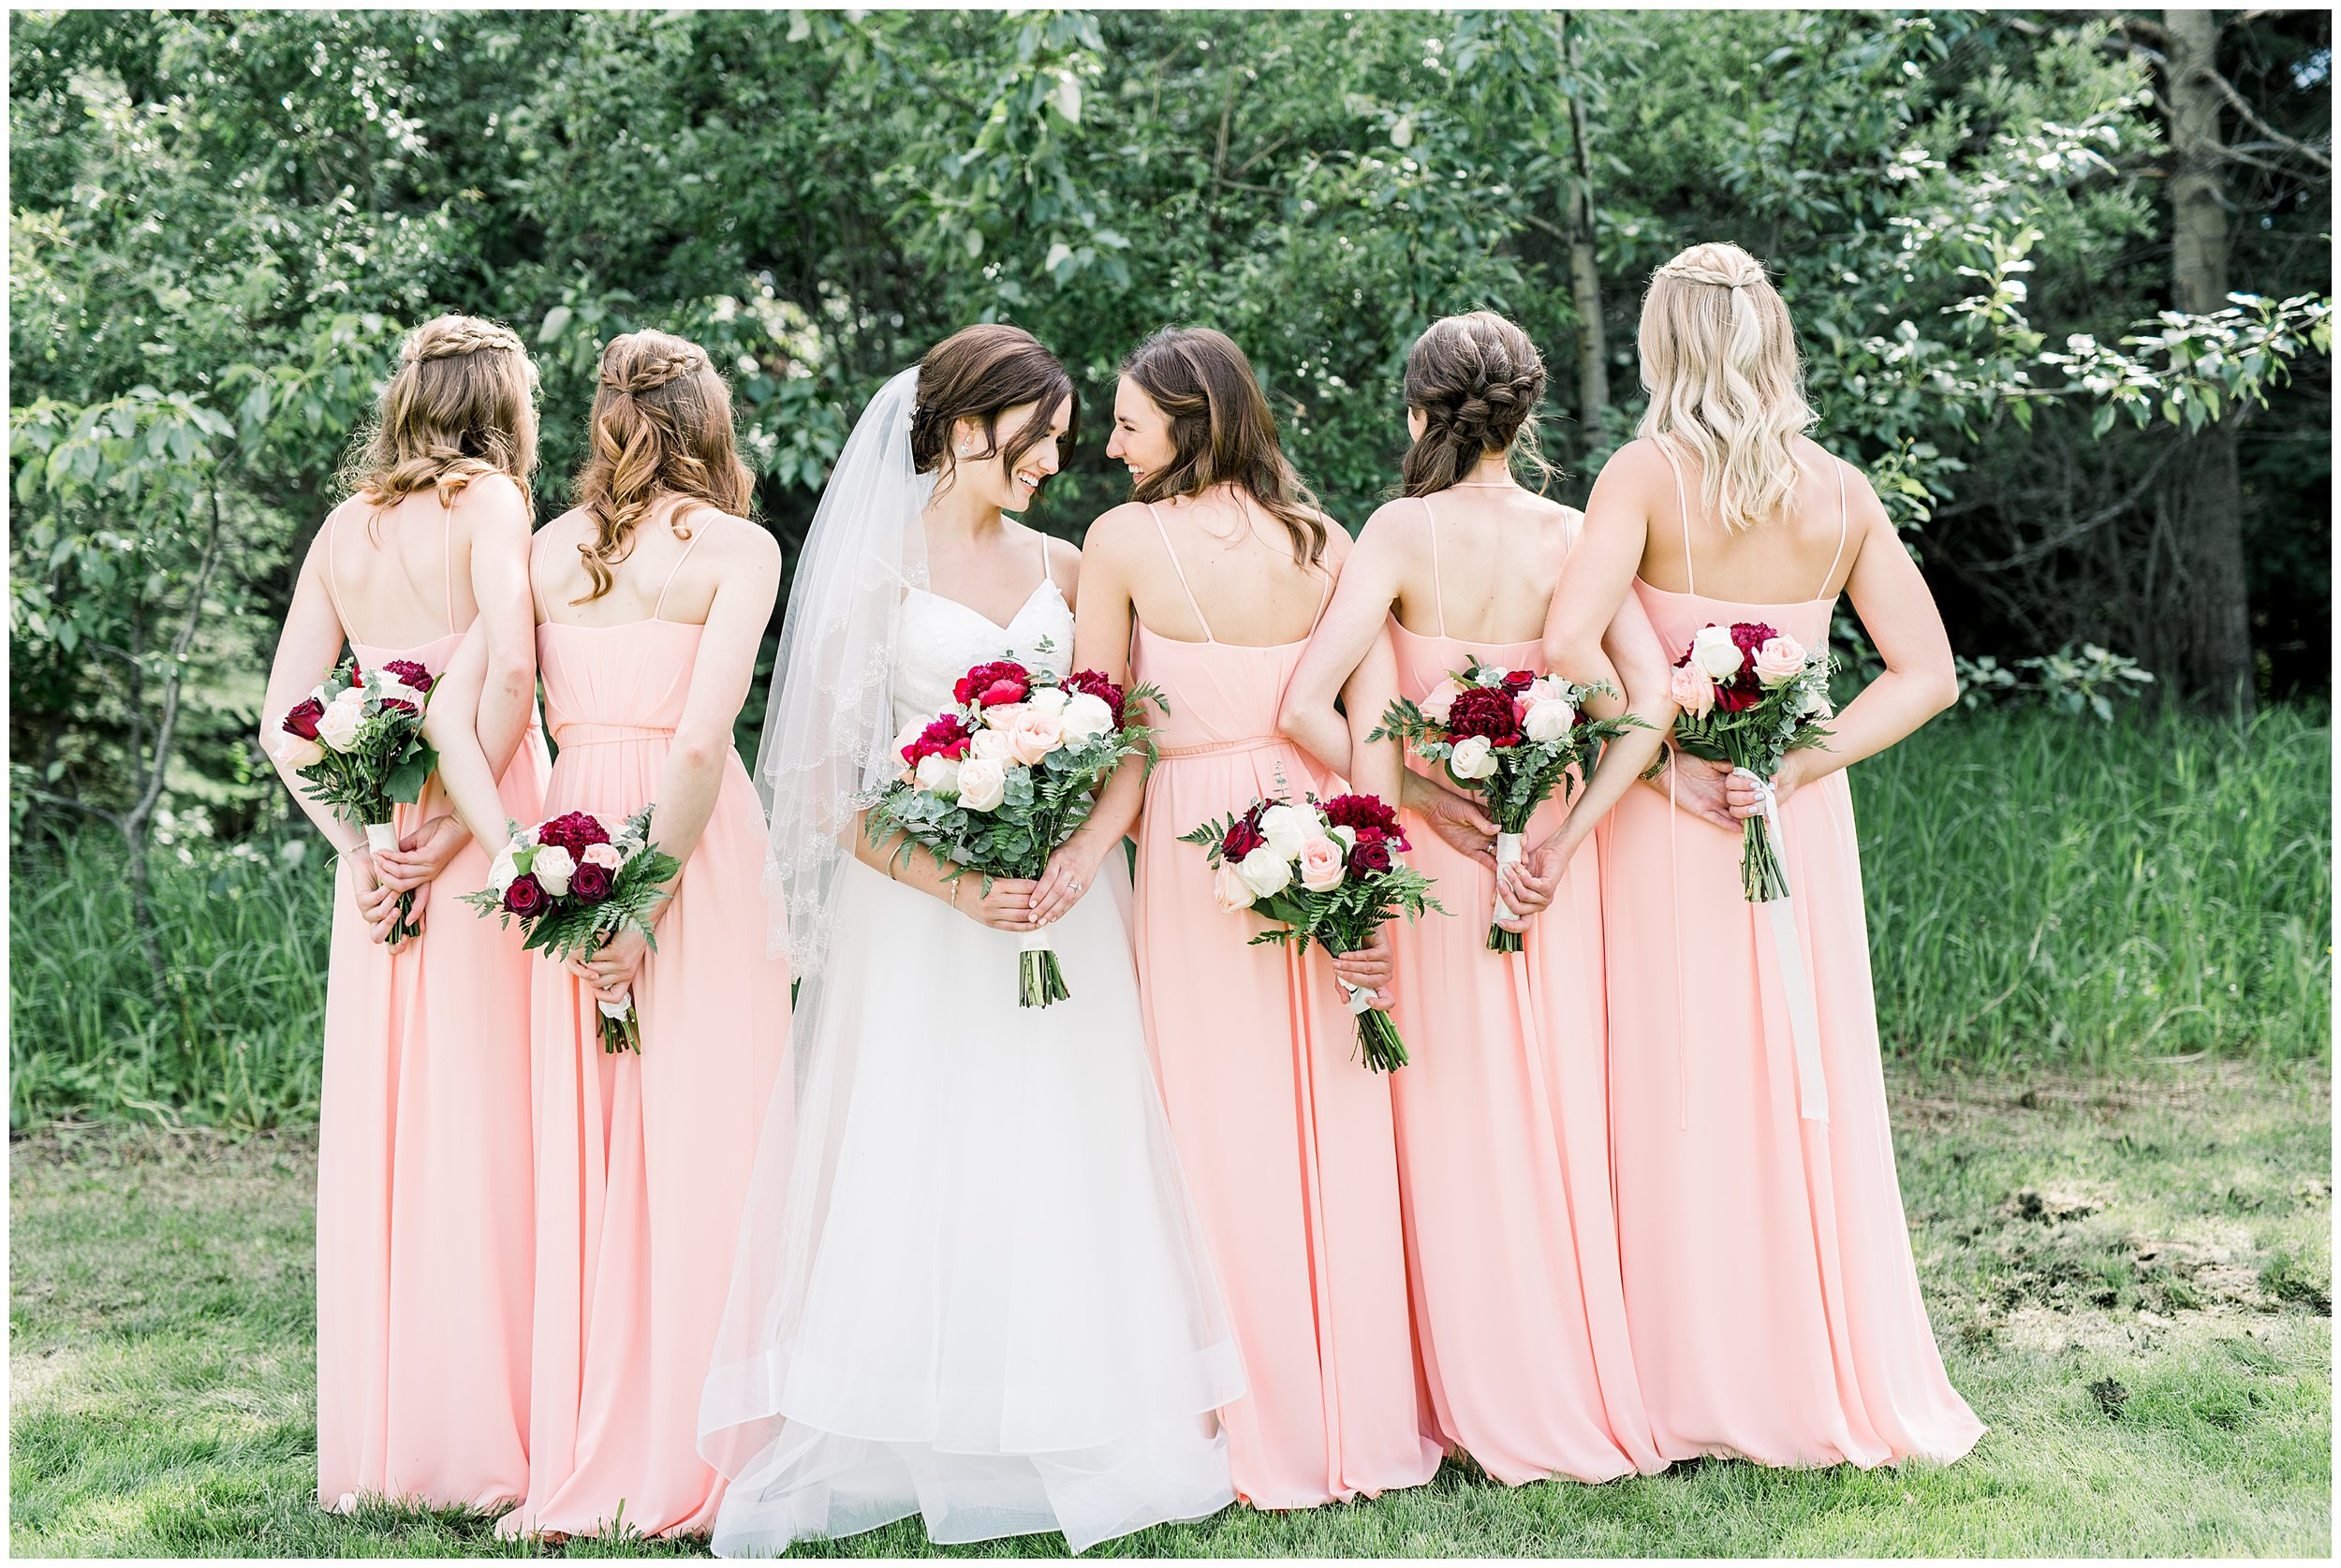 Alyssa-Poland-Photography_0612_alberta wedding.jpg